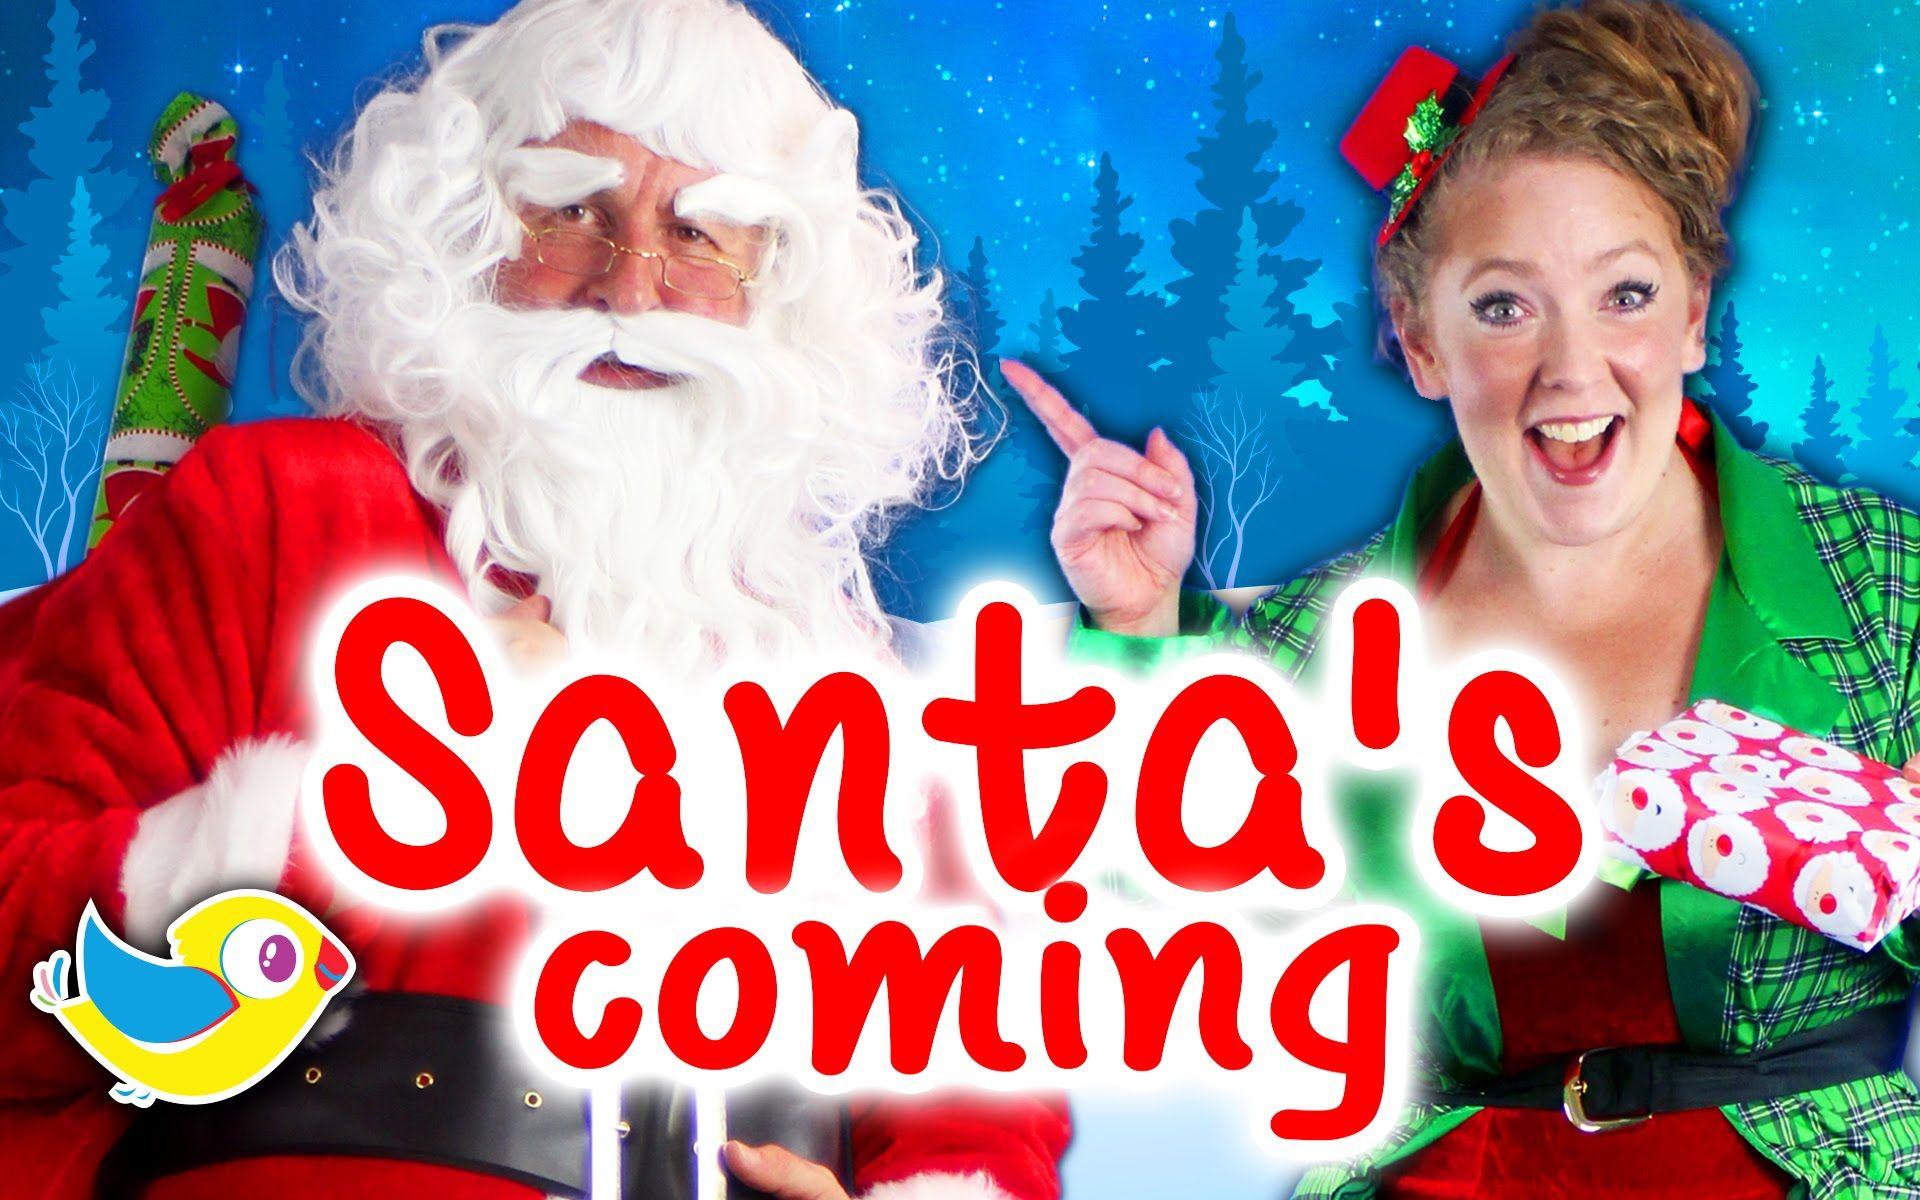 Santa's Coming - Kids Christmas Song - Bounce Patrol